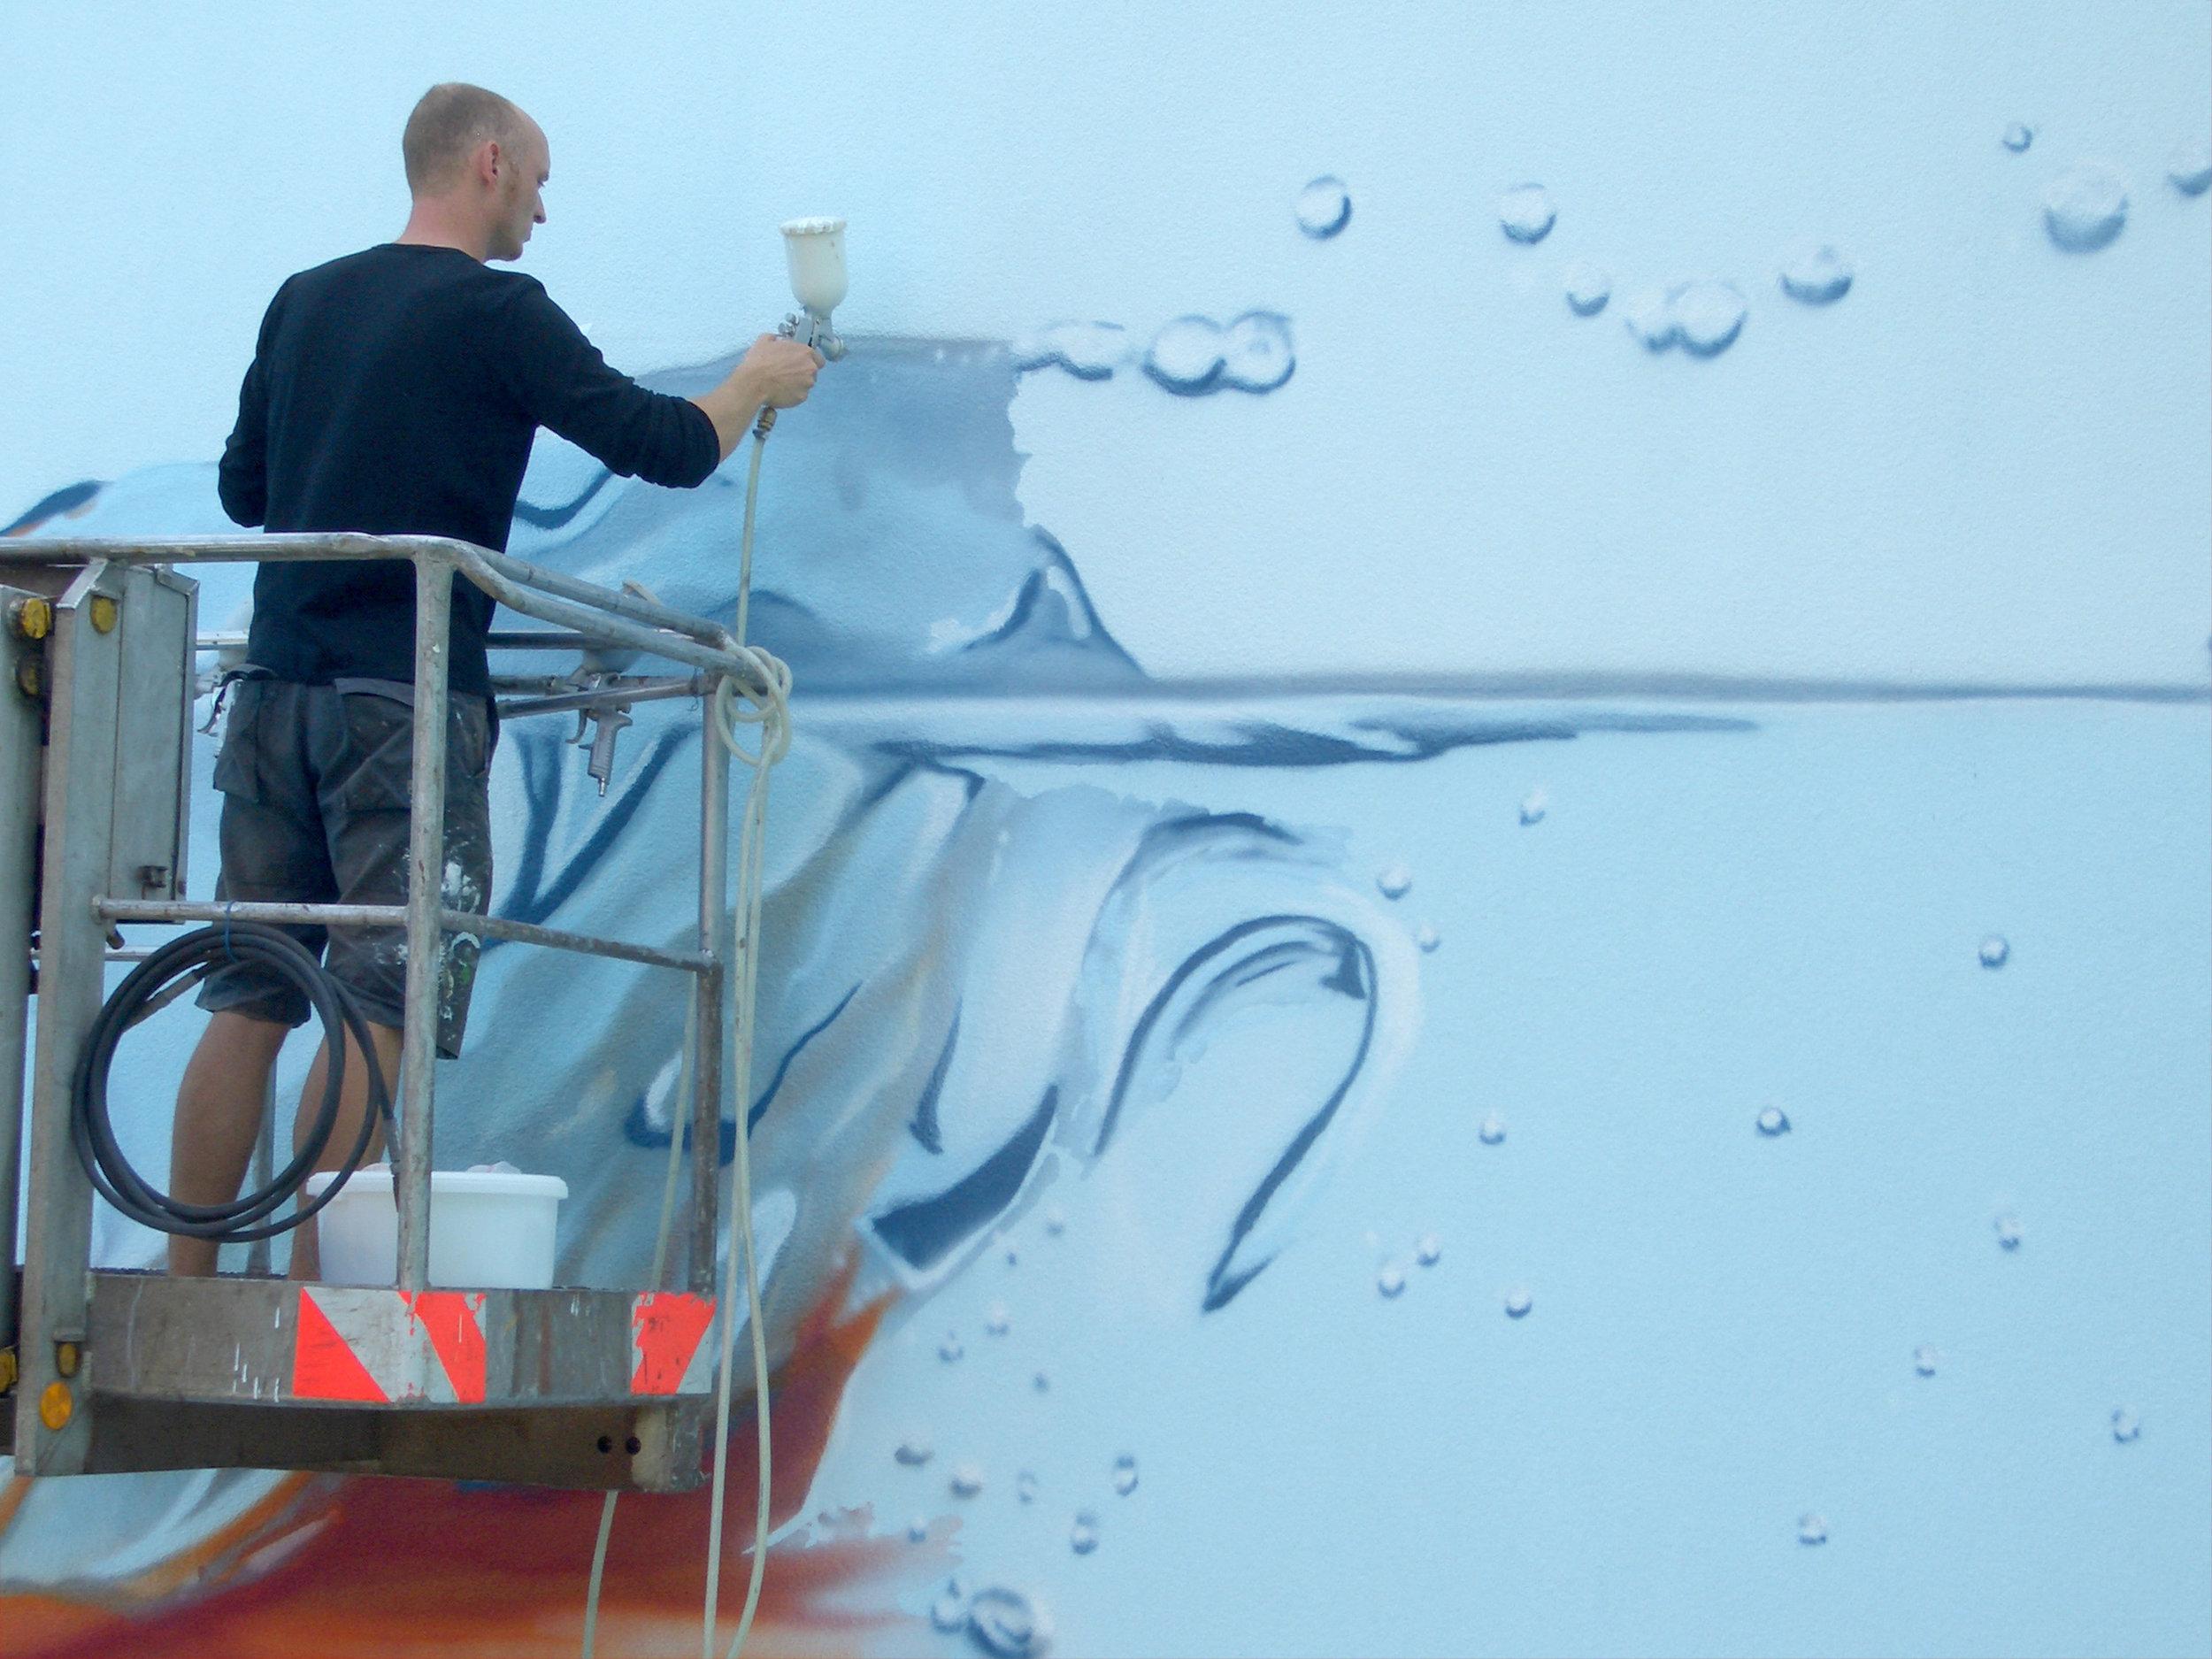 Fassadengestaltung-kein-graffiti-aquarium-wandfarbe.jpg